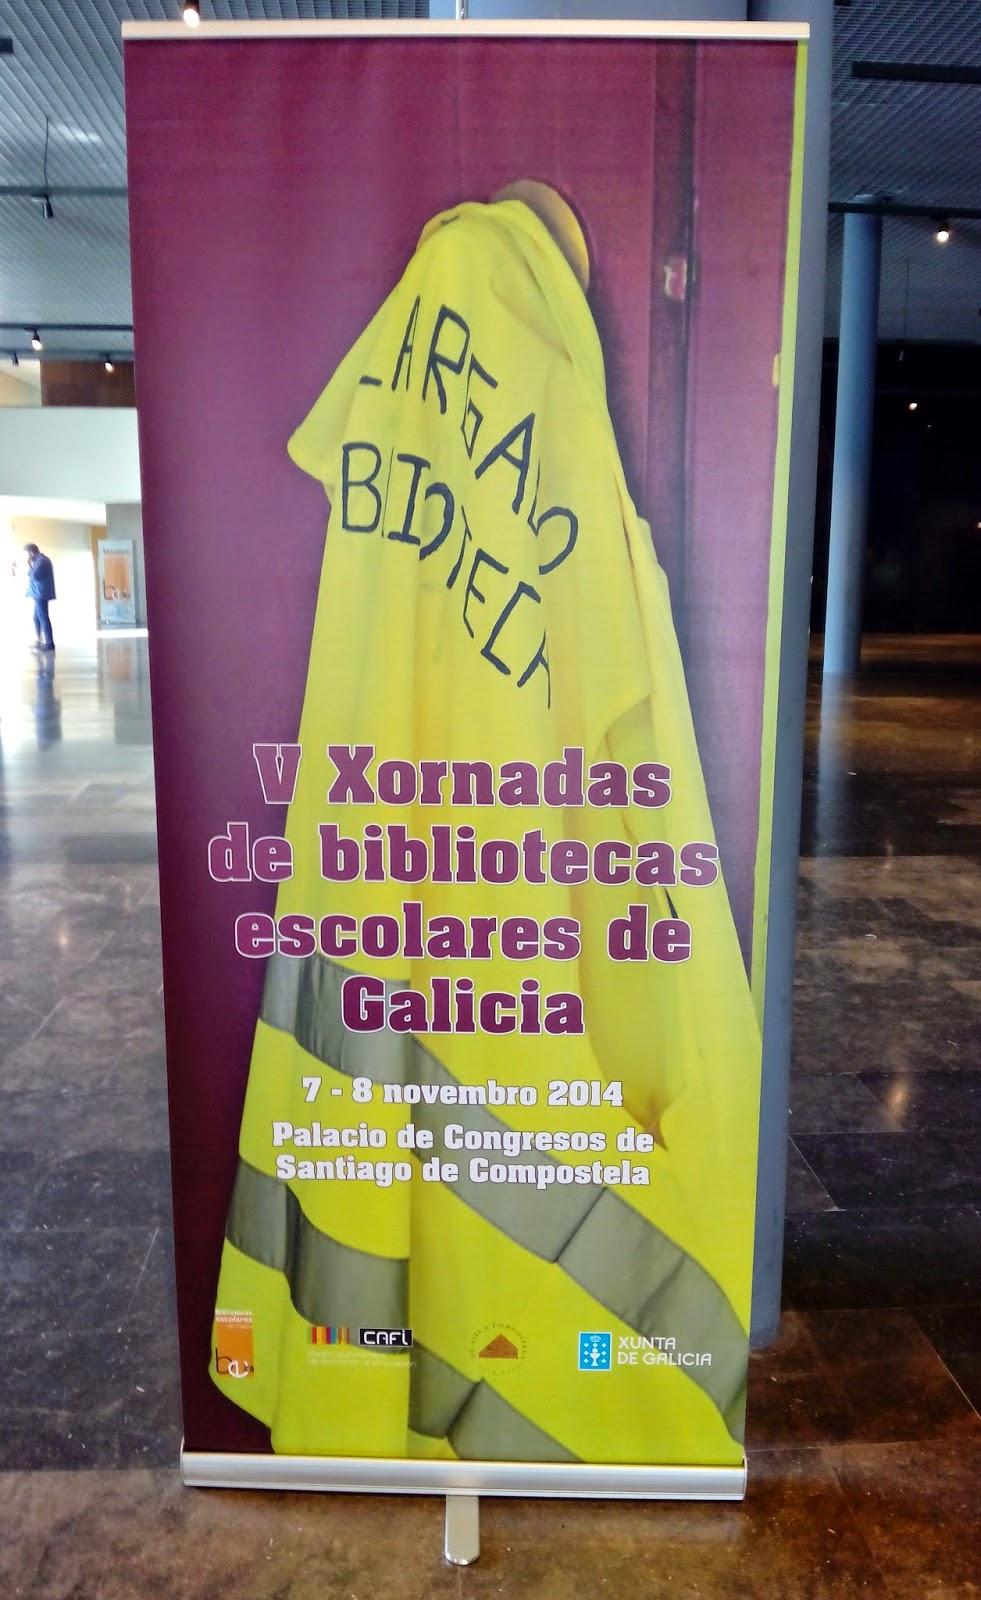 http://www.edu.xunta.es/biblioteca/blog/files/progrma_14_15.pdf